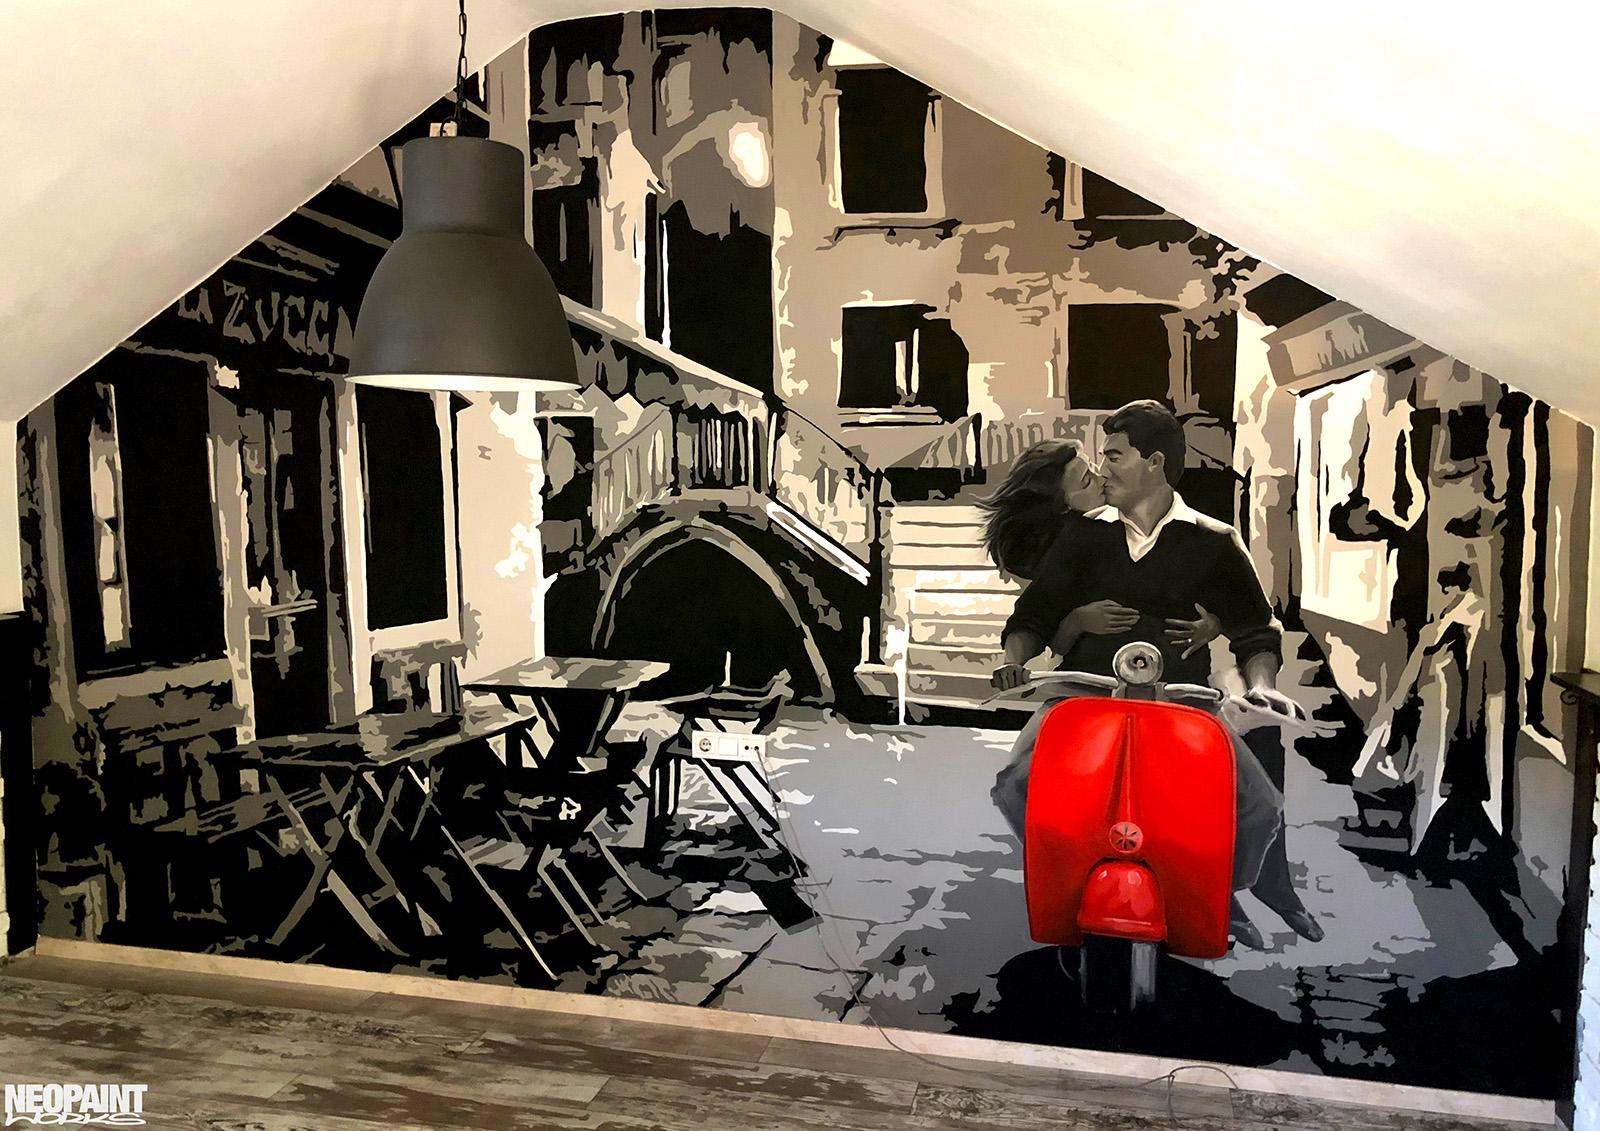 festett faldekoráció - graffiti - faldekor - neopaint works